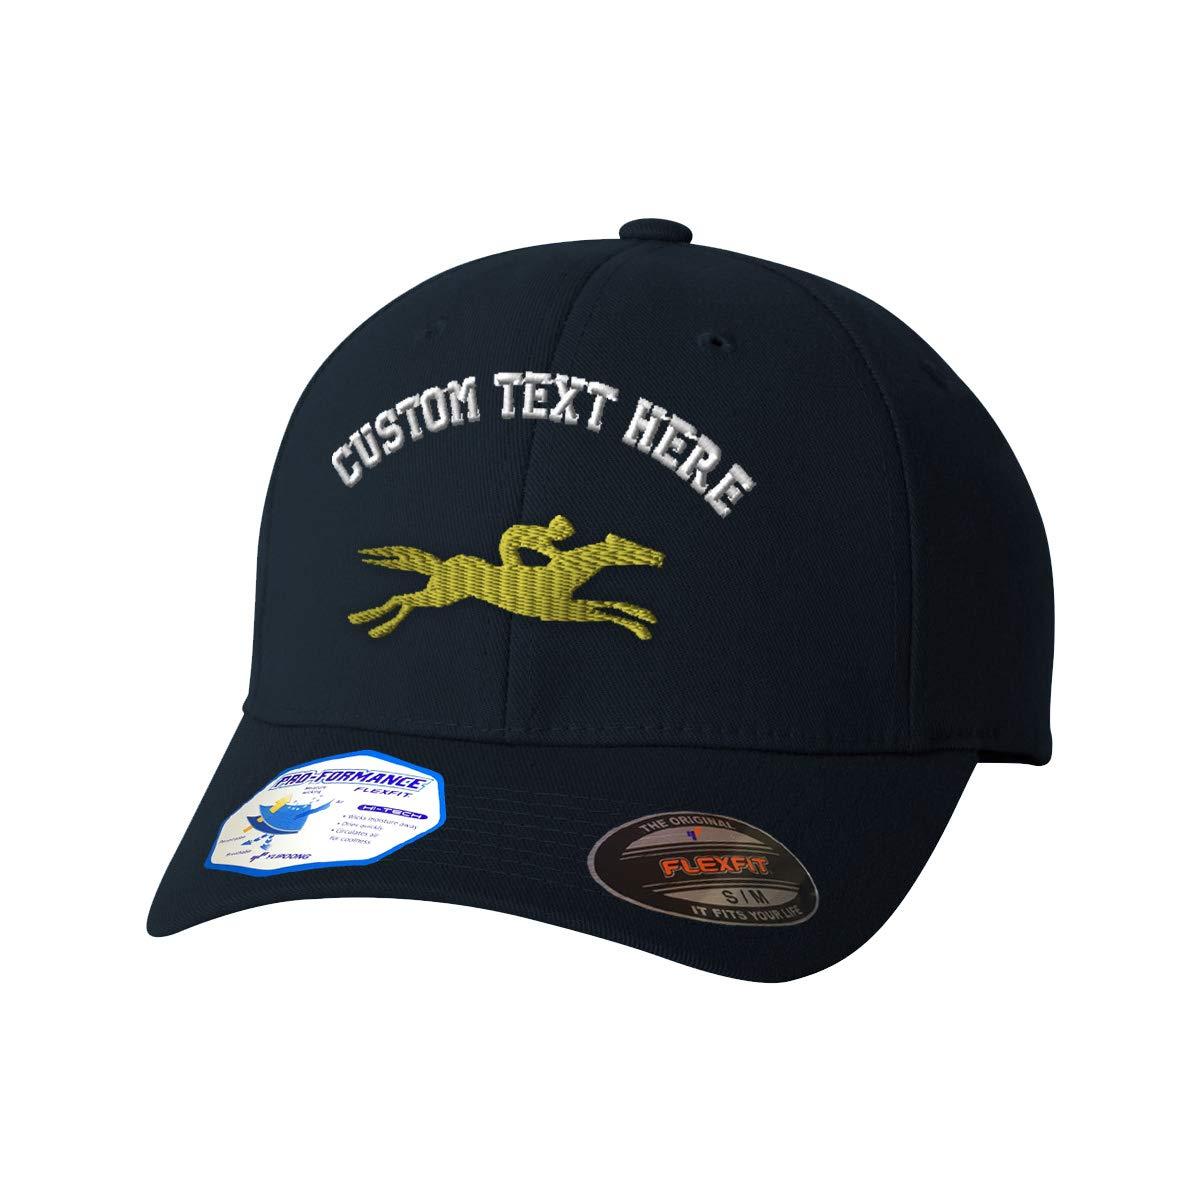 a4428b07082 Amazon.com  Custom Text Embroidered Horse Racing Flexfit Hat Baseball Cap  Dark Navy  Clothing